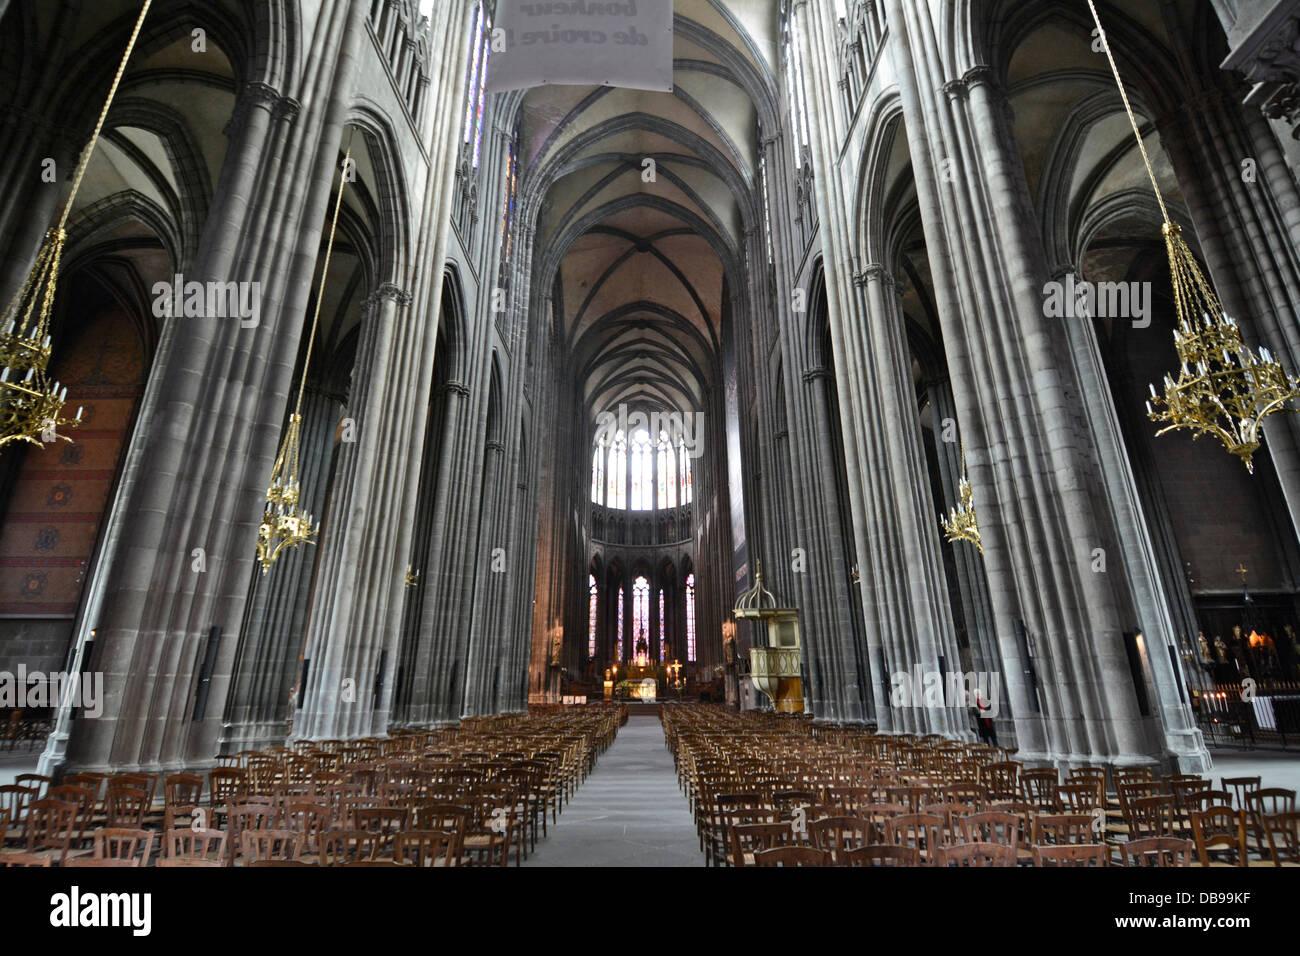 Clermont ferrand cathedral photos clermont ferrand cathedral images alamy - Puy de dome office du tourisme ...